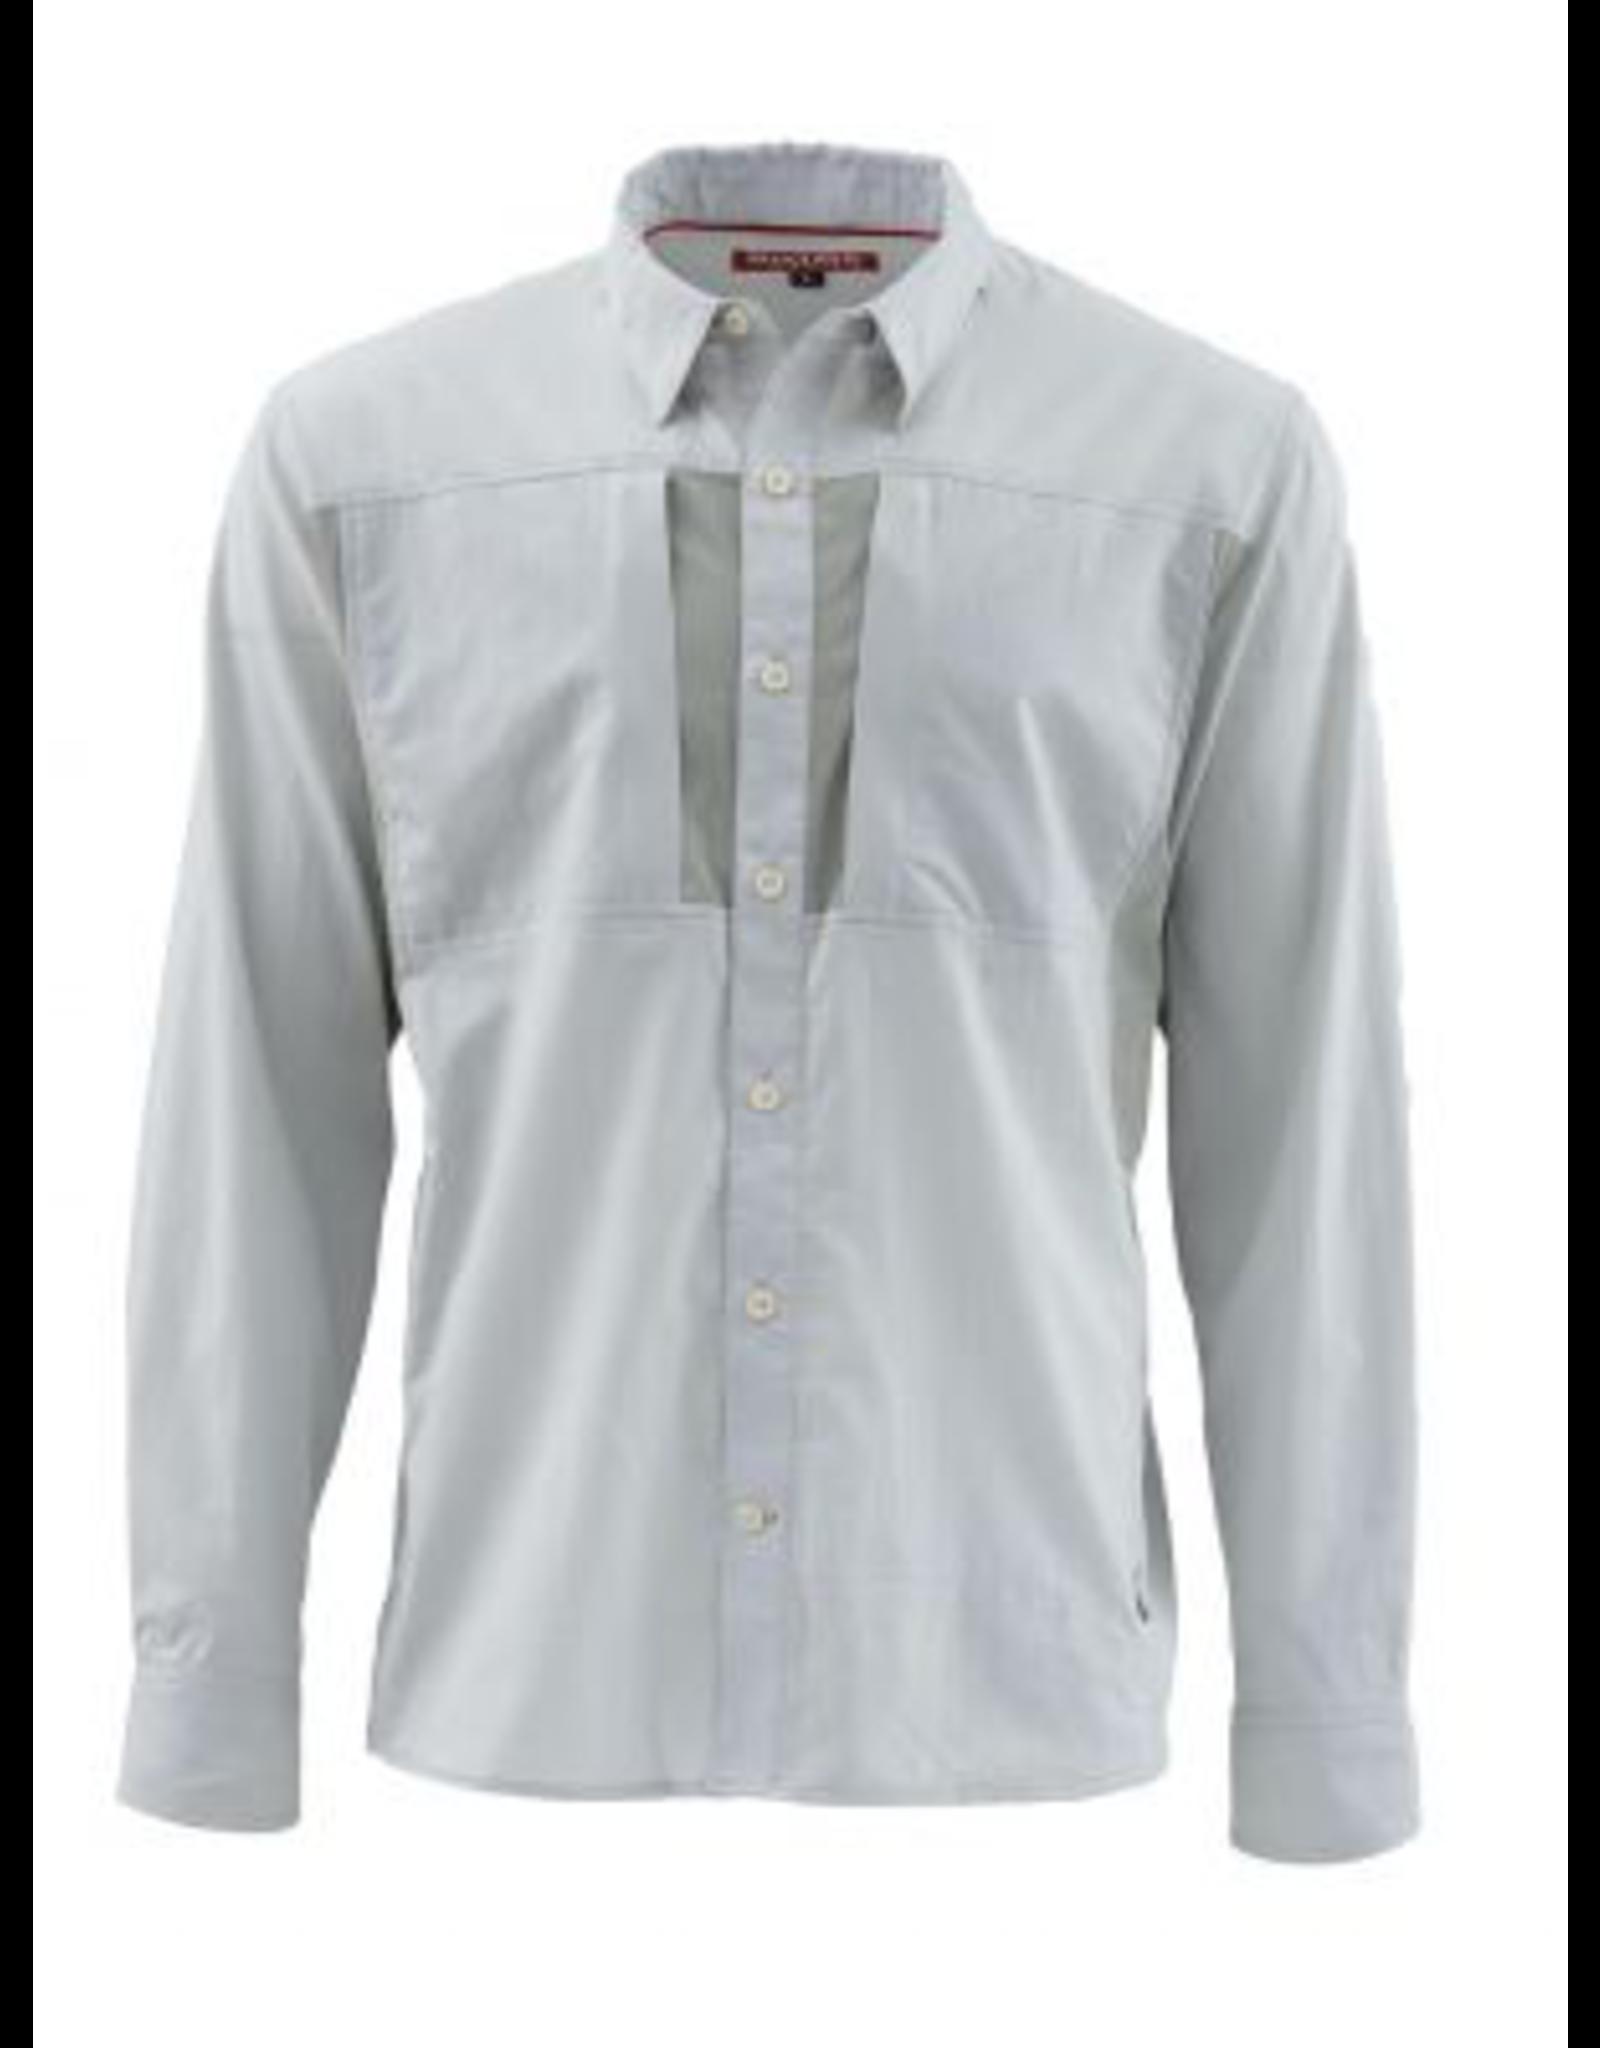 Simms SIMMS Albie Fishing Shirt